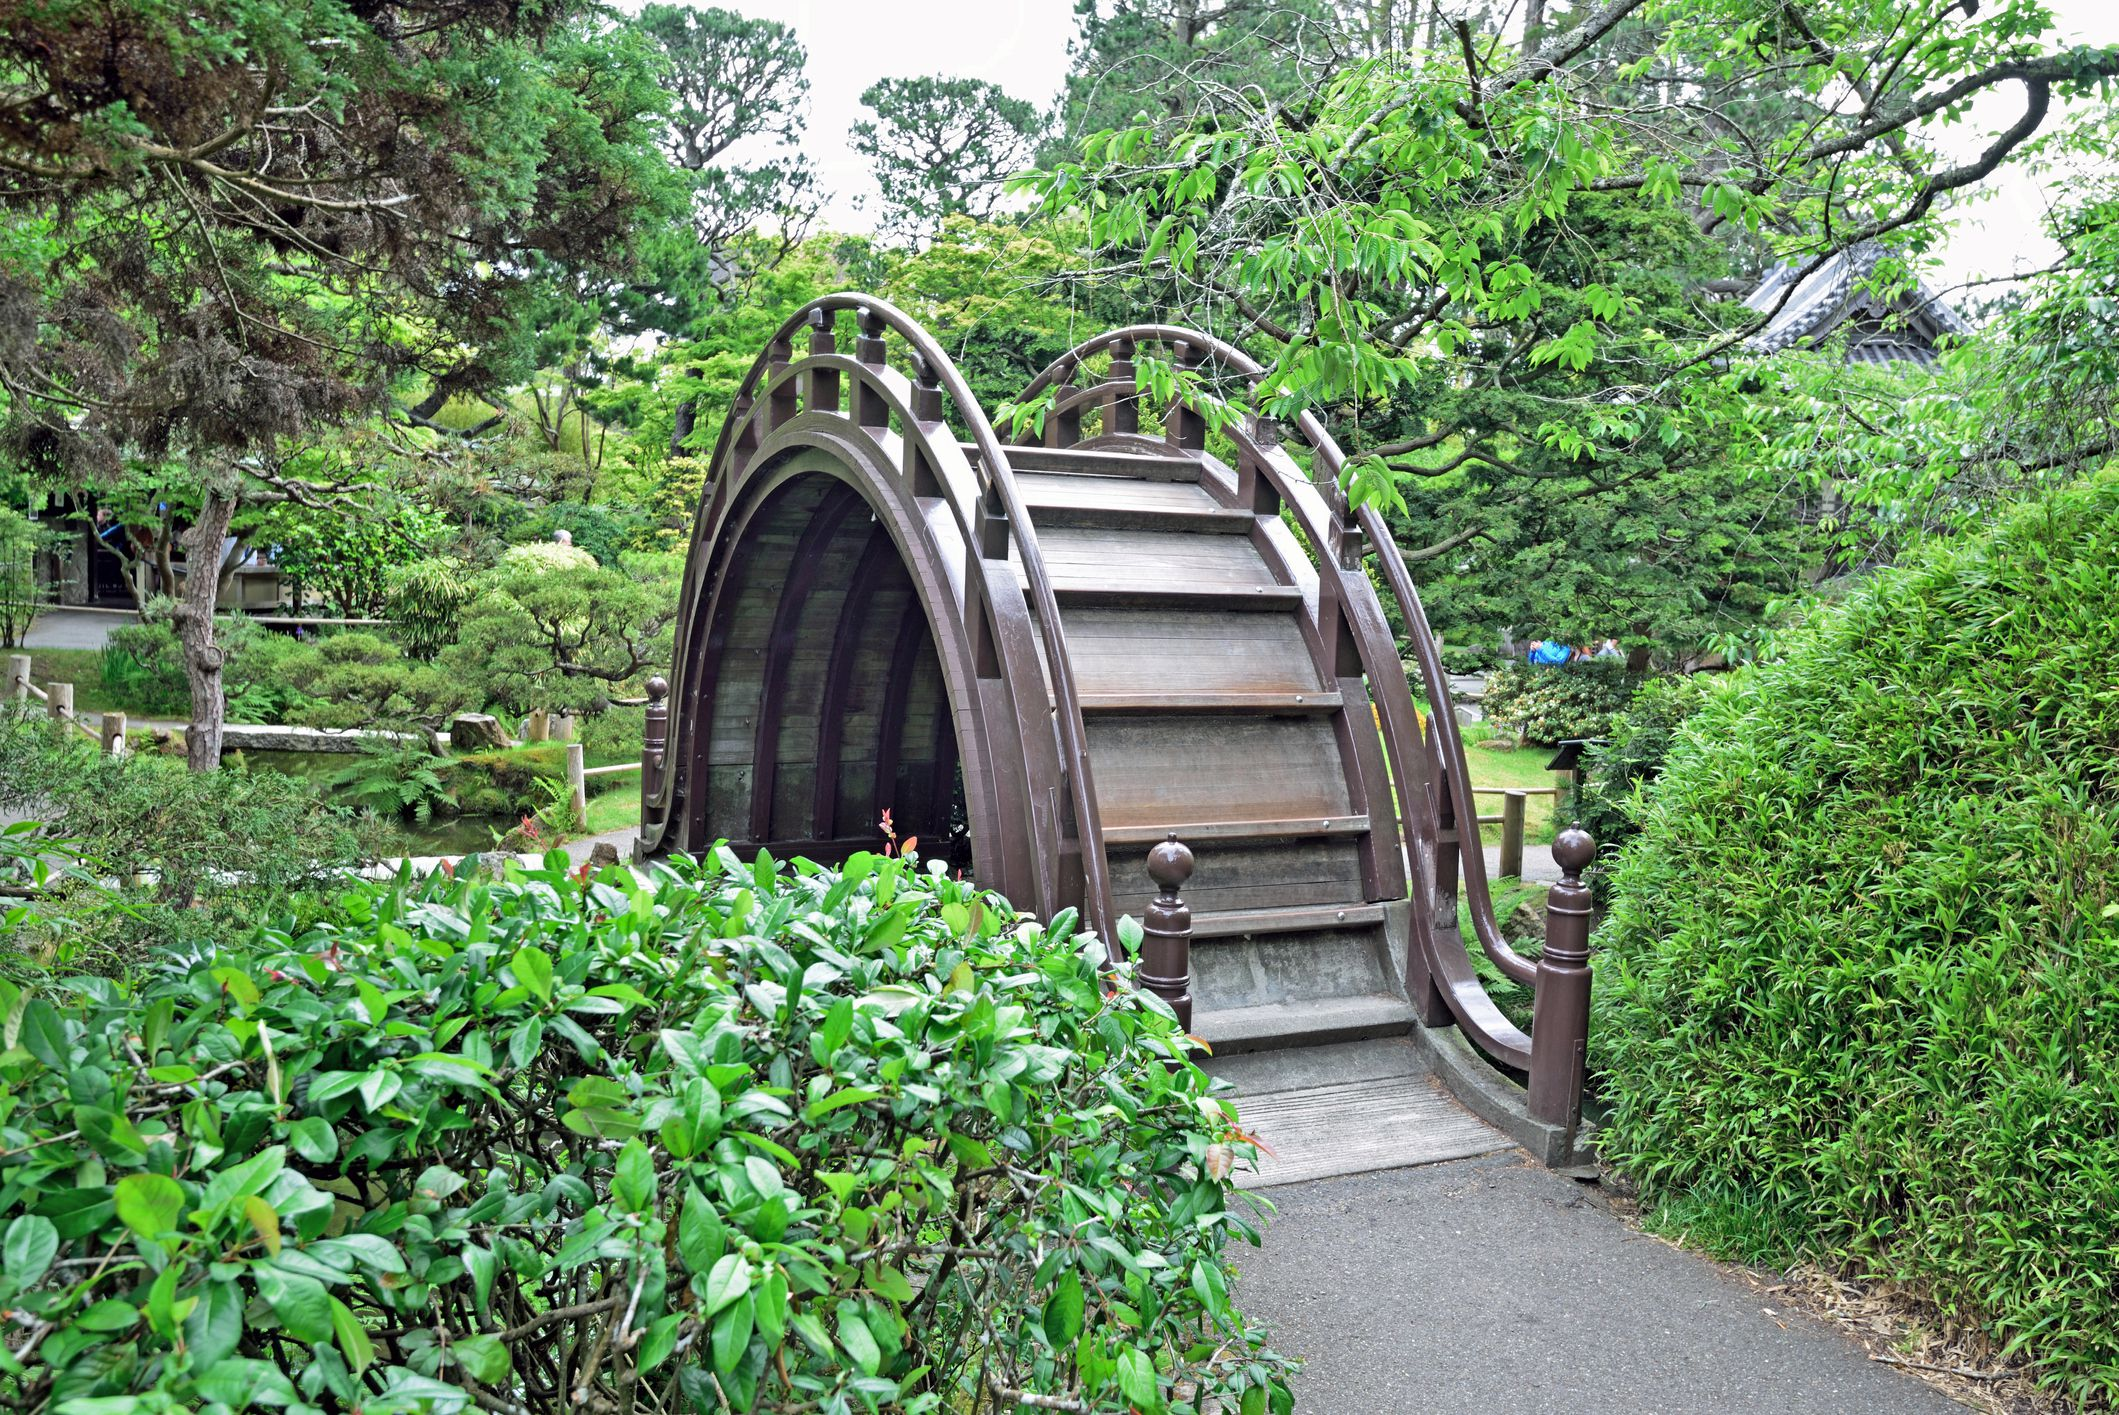 A Guide To The Japanese Tea Garden In Golden Gate Park